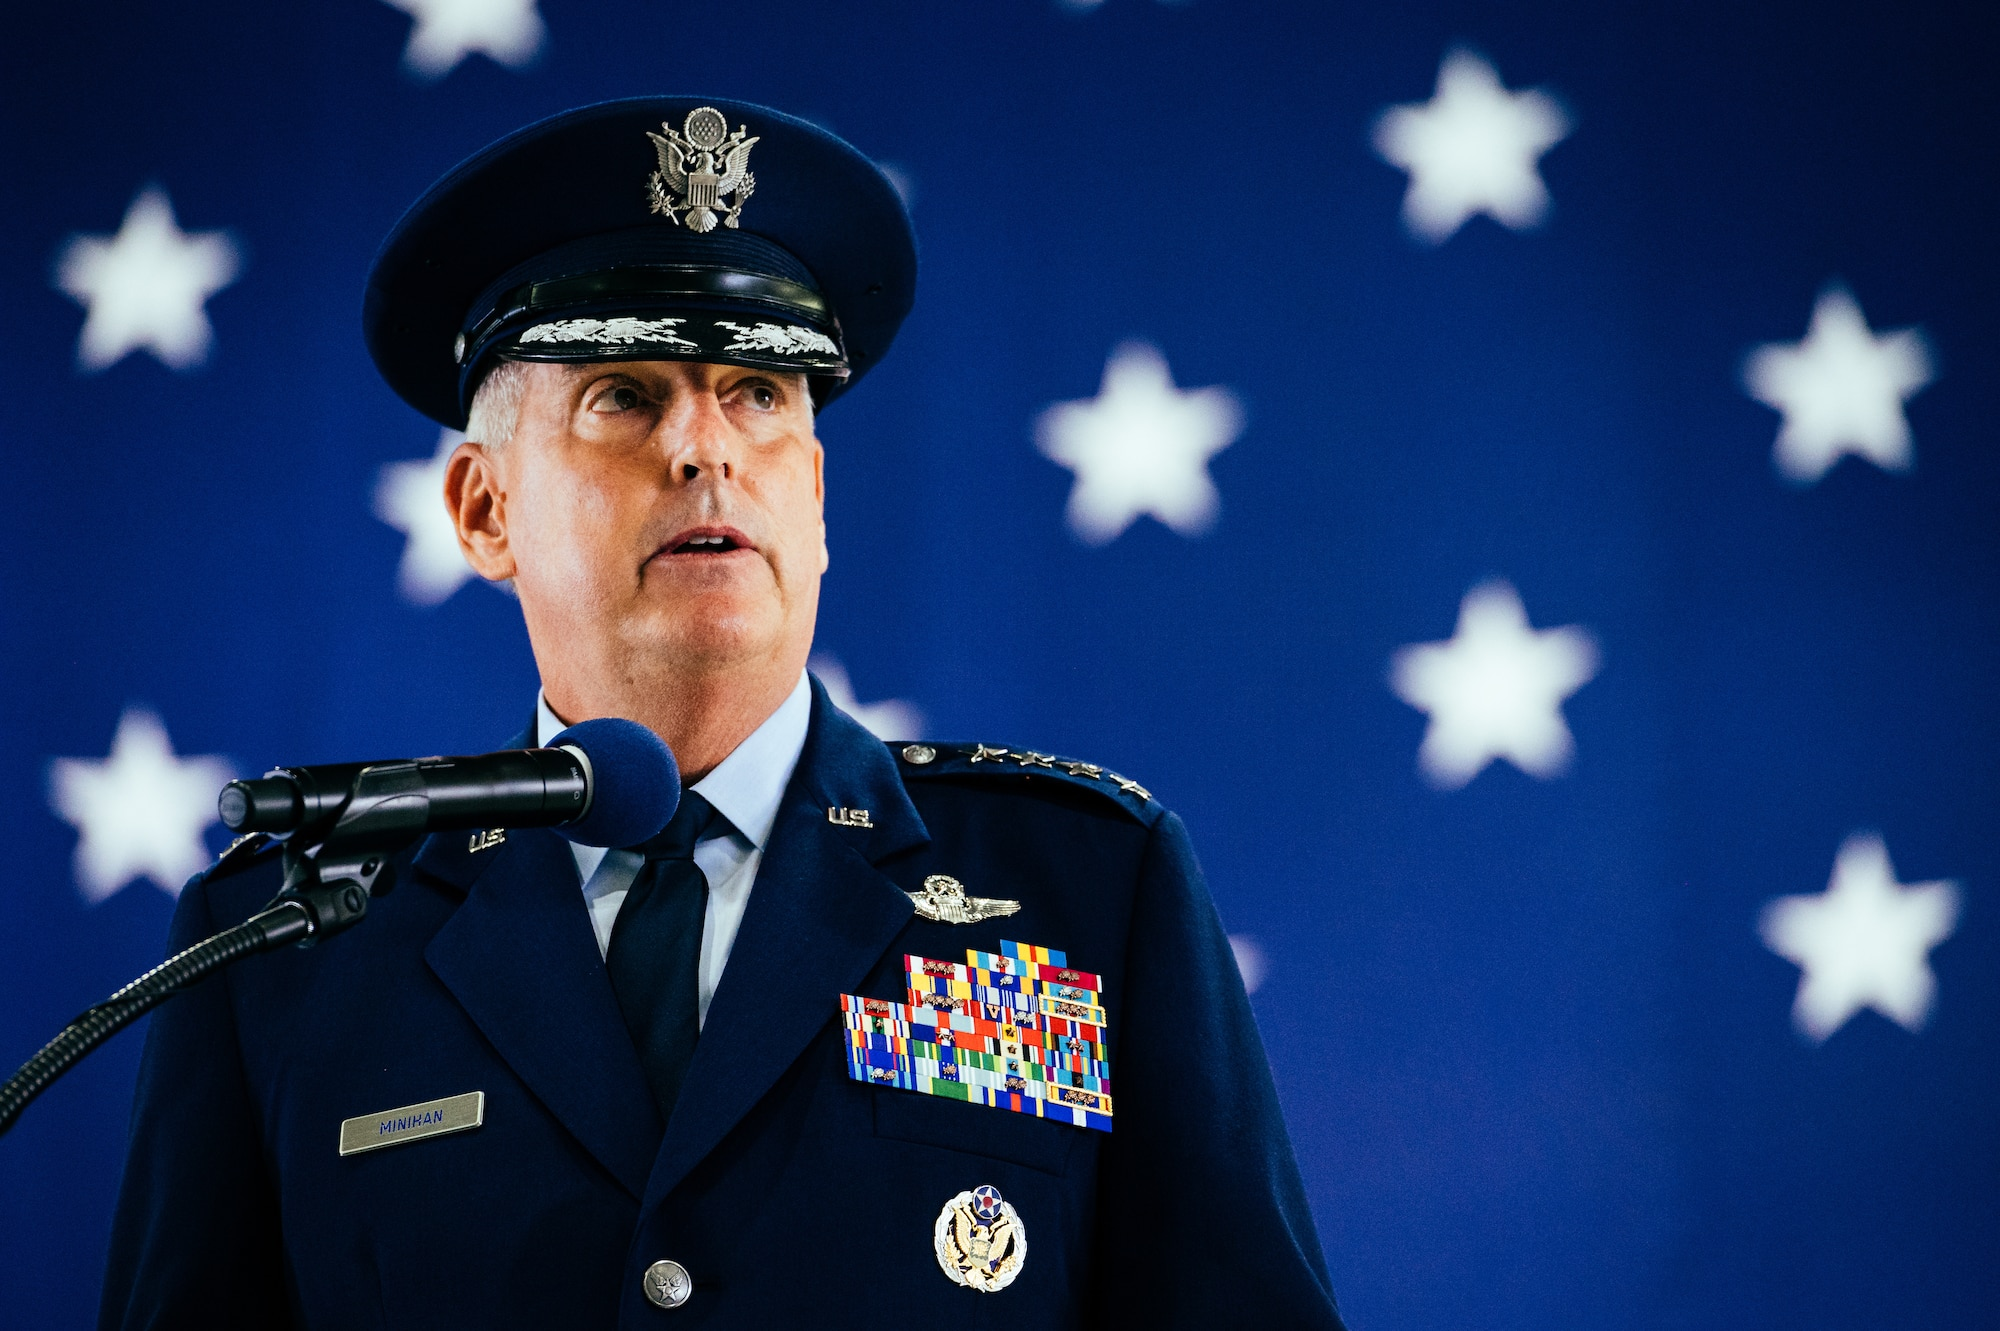 Gen. Mike Minihan, incoming Air Mobility Command commander, gives a speech at Scott Air Force Base, Ill., Oct. 5, 2021. Minihan succeeded Gen. Jacqueline D. Van Ovost.